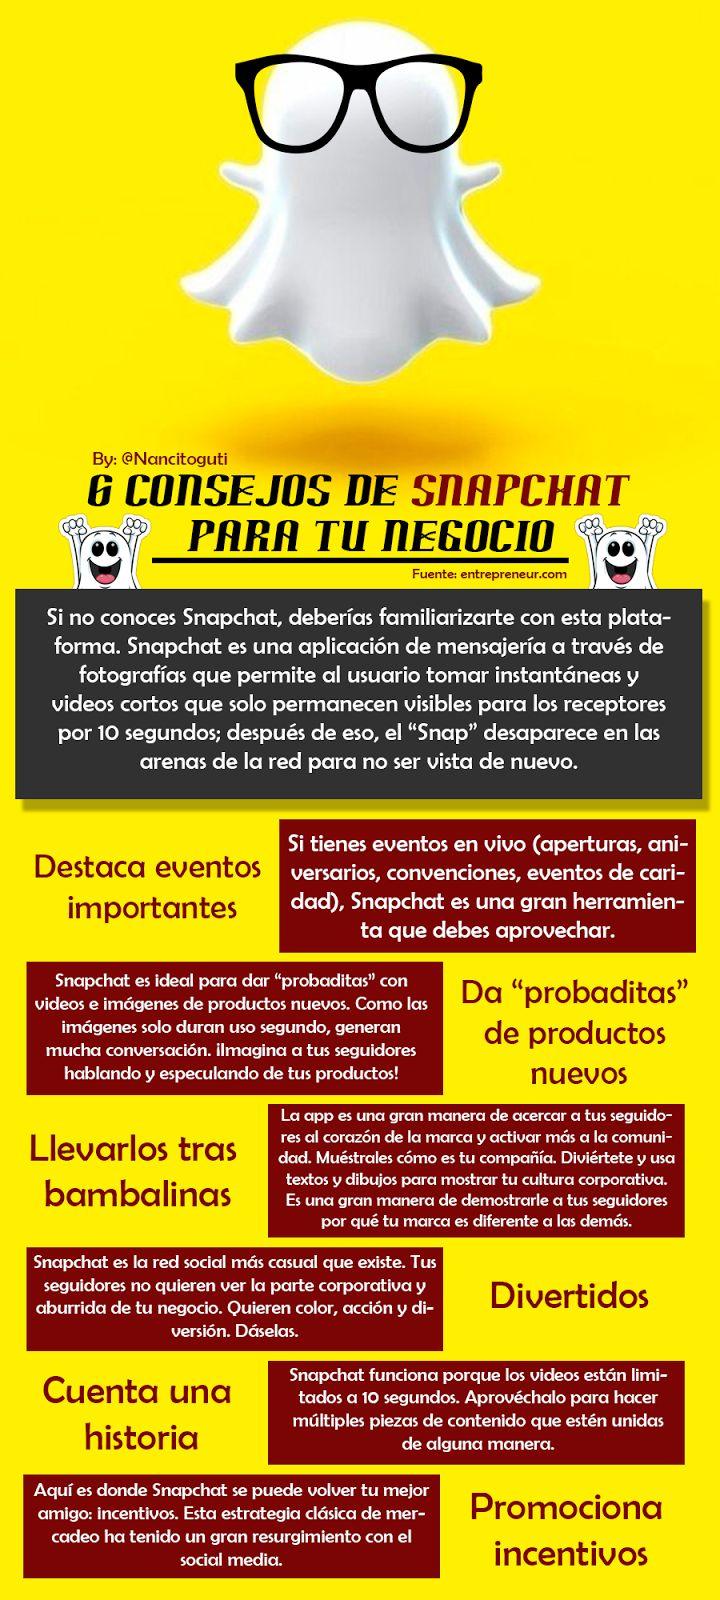 6 CONSEJOS SOBRE SNAPCHAT PARA TU EMPRESA #INFOGRAFIA #INFOGRAPHIC #SOCIALMEDIA